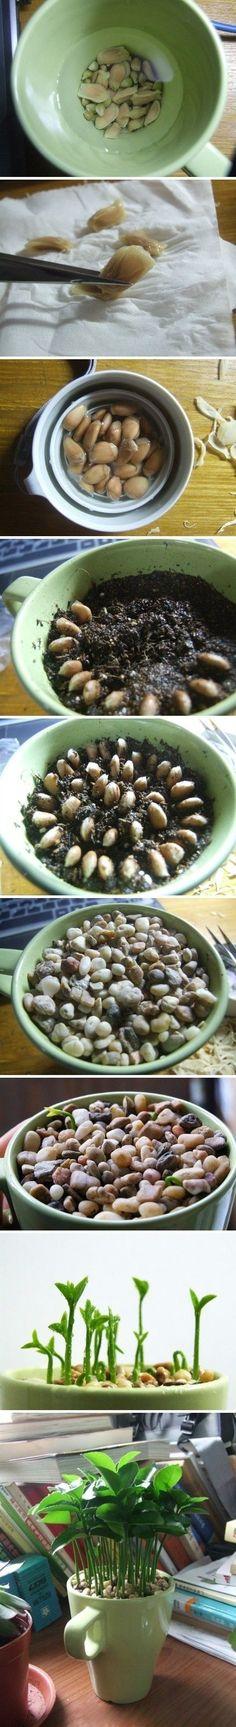 planting lemon seeds for natural air freshener